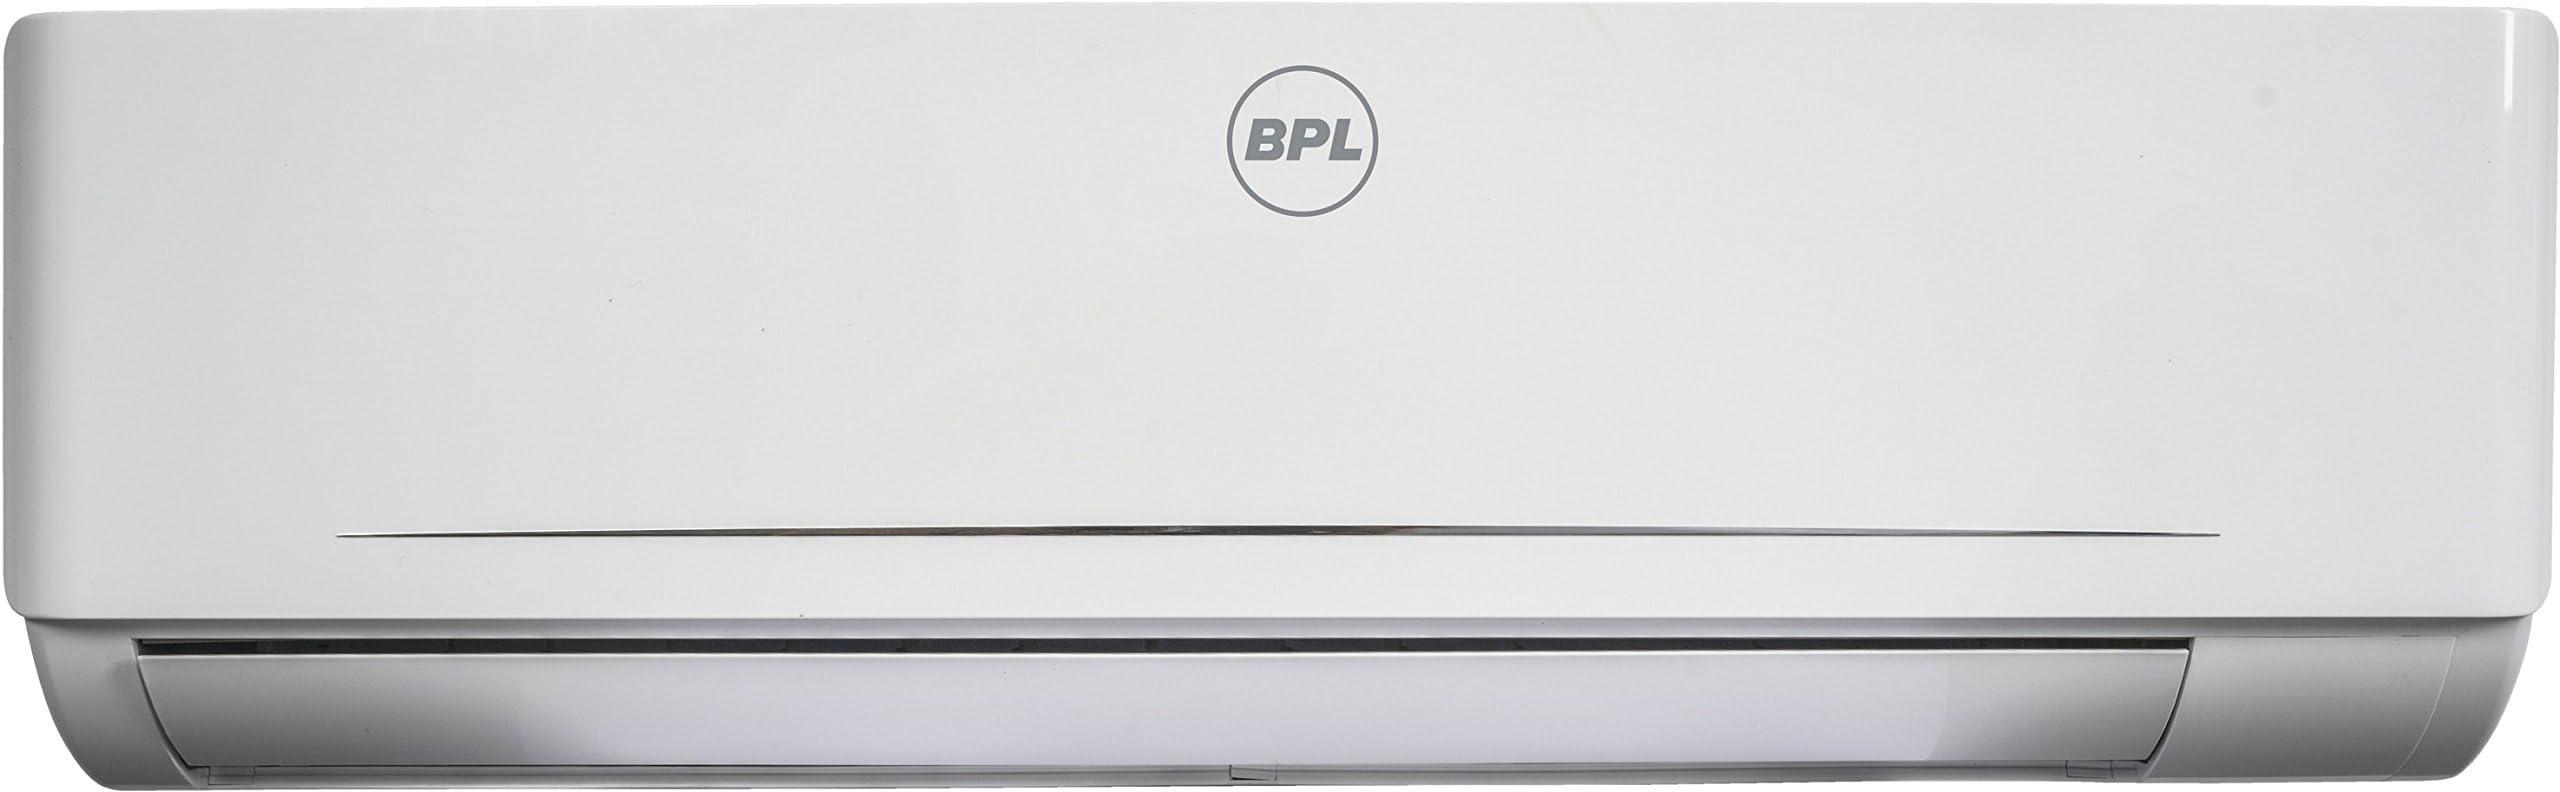 BPL AC